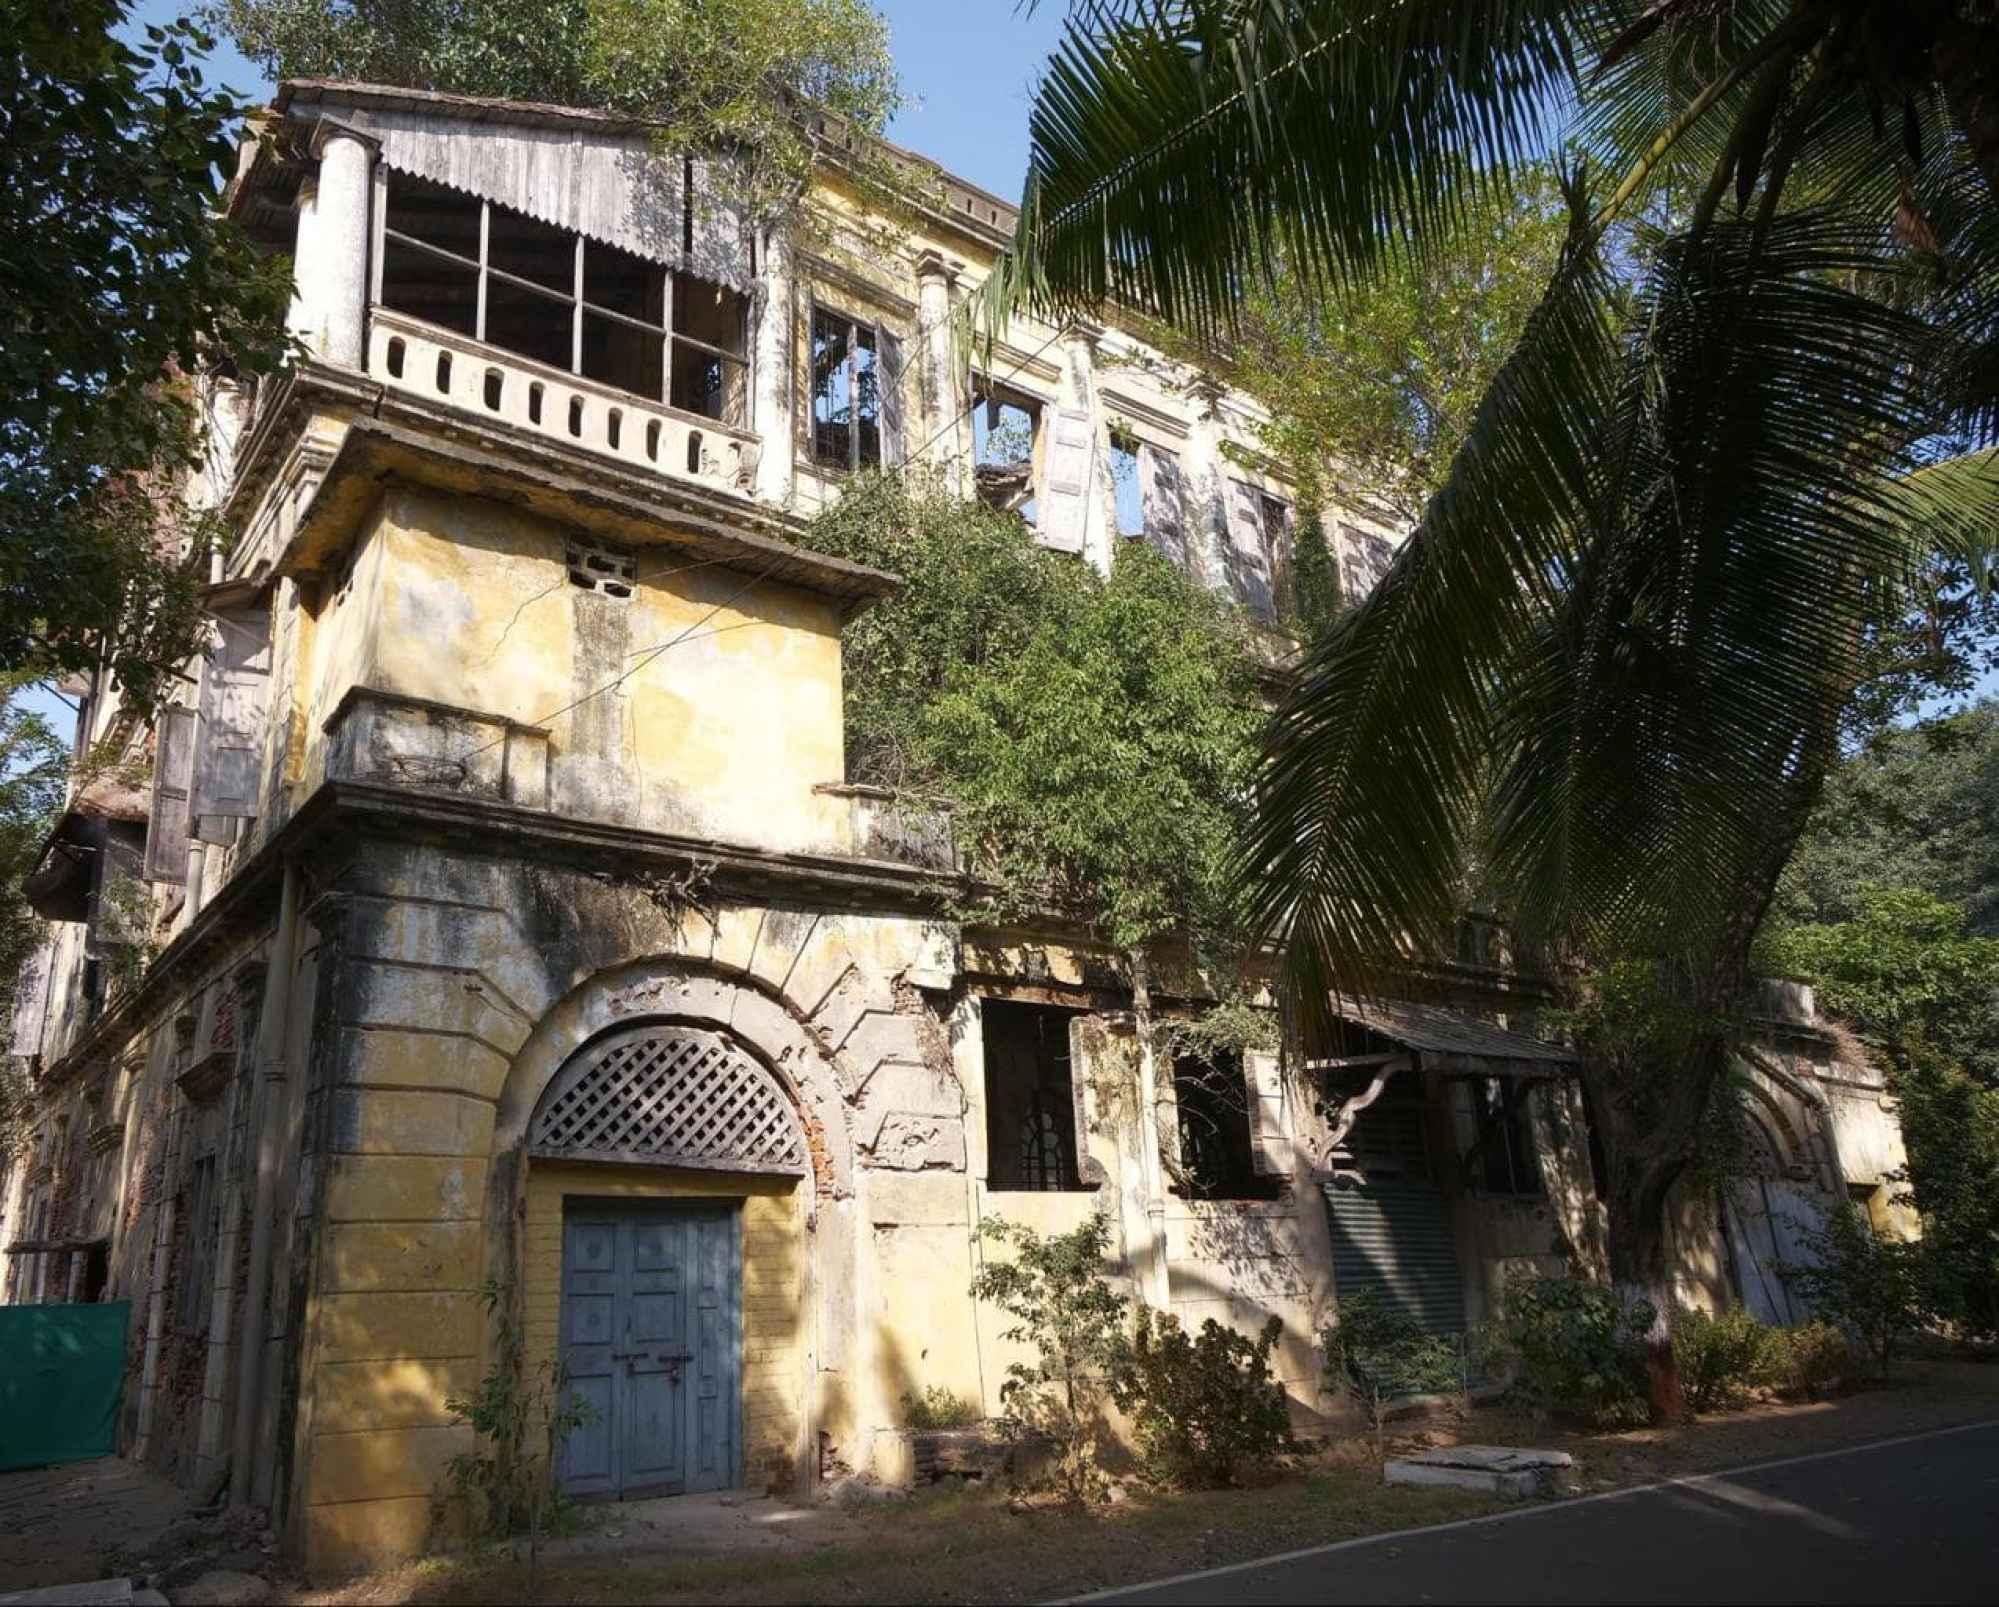 Fort St. George abandoned building